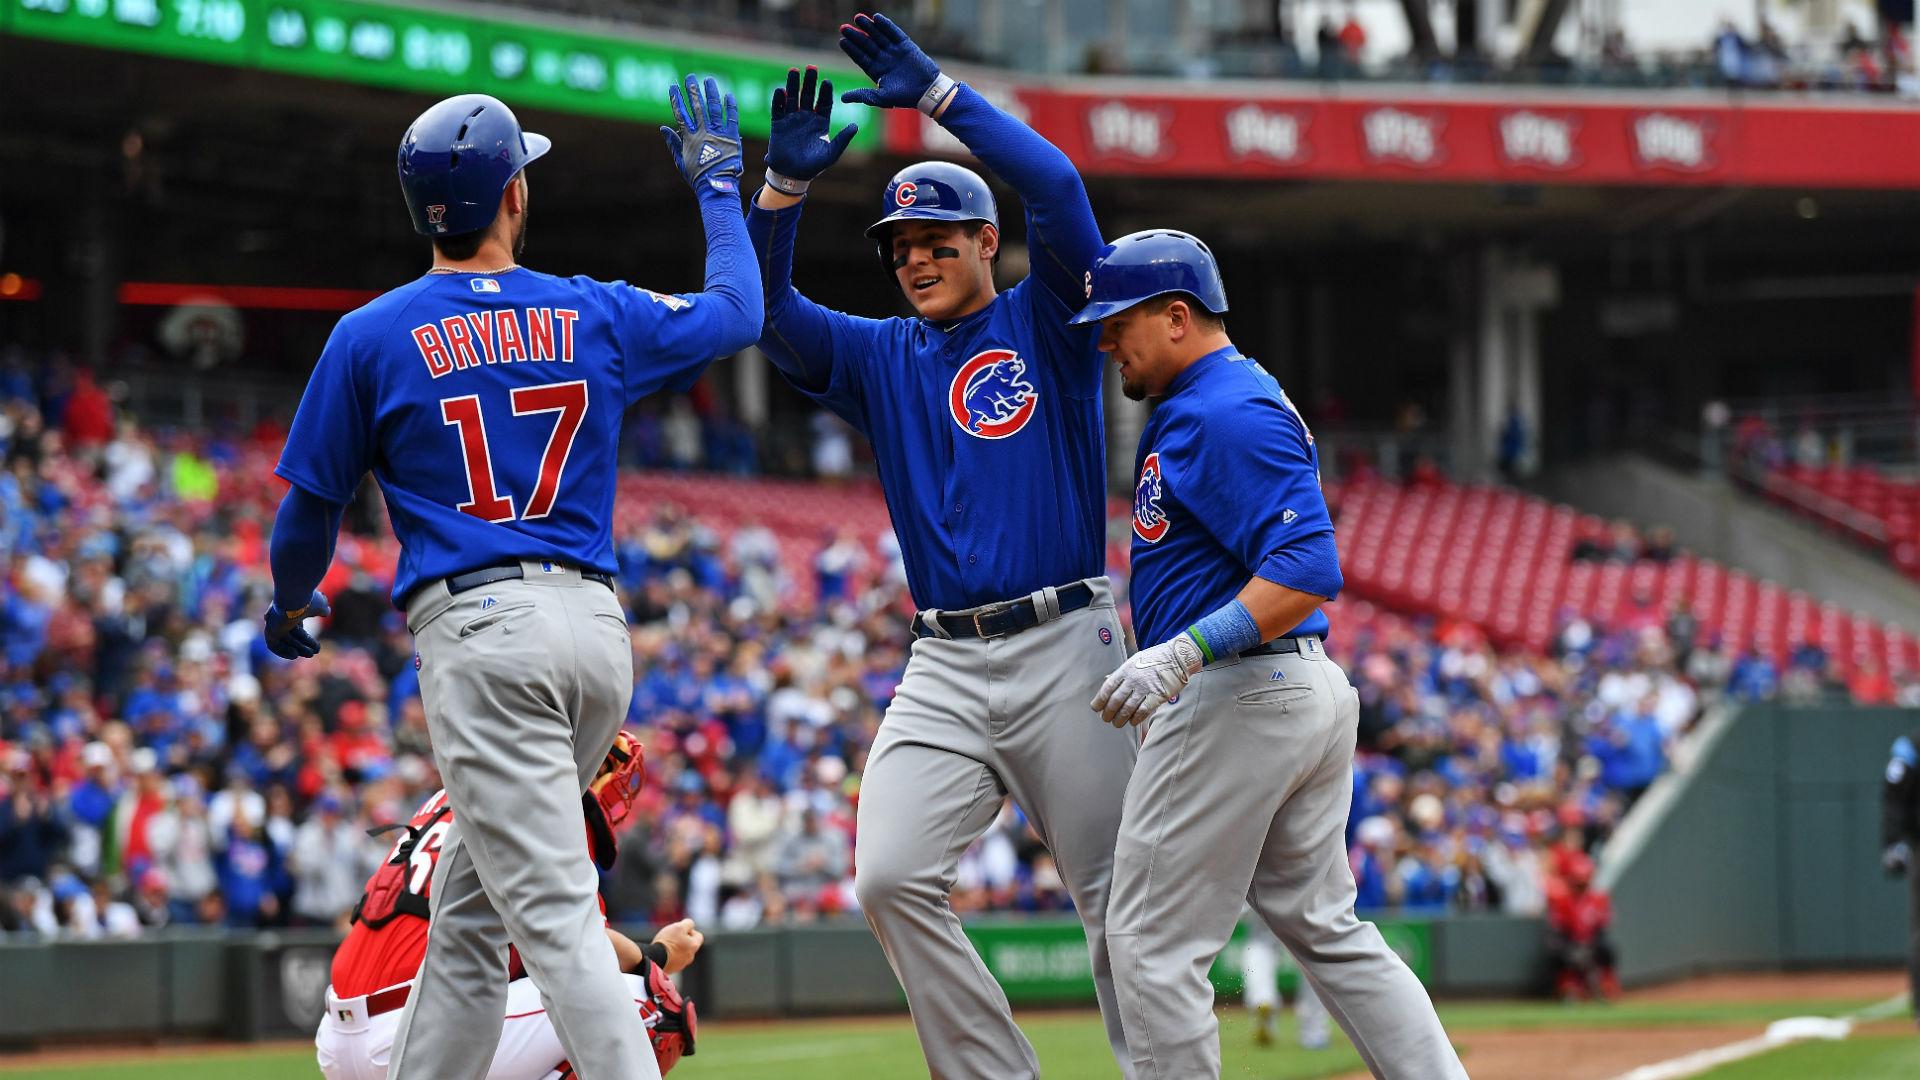 Cubs-chicago-usnews-getty-ftr_13cwqwi6rzkcd1nkrtwbdur44k